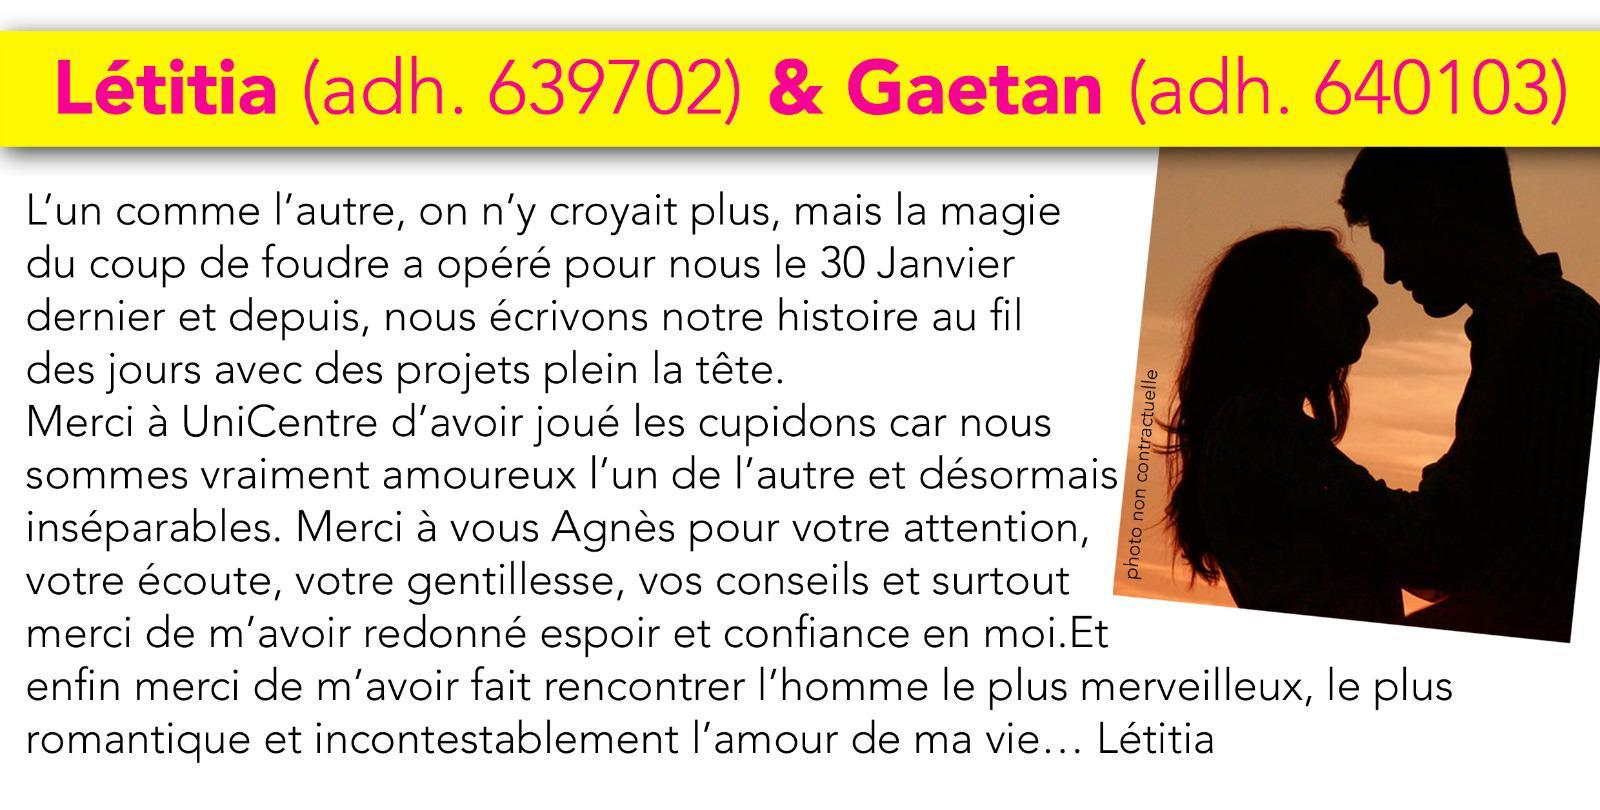 letitia-adh-Agnes-ALLOU